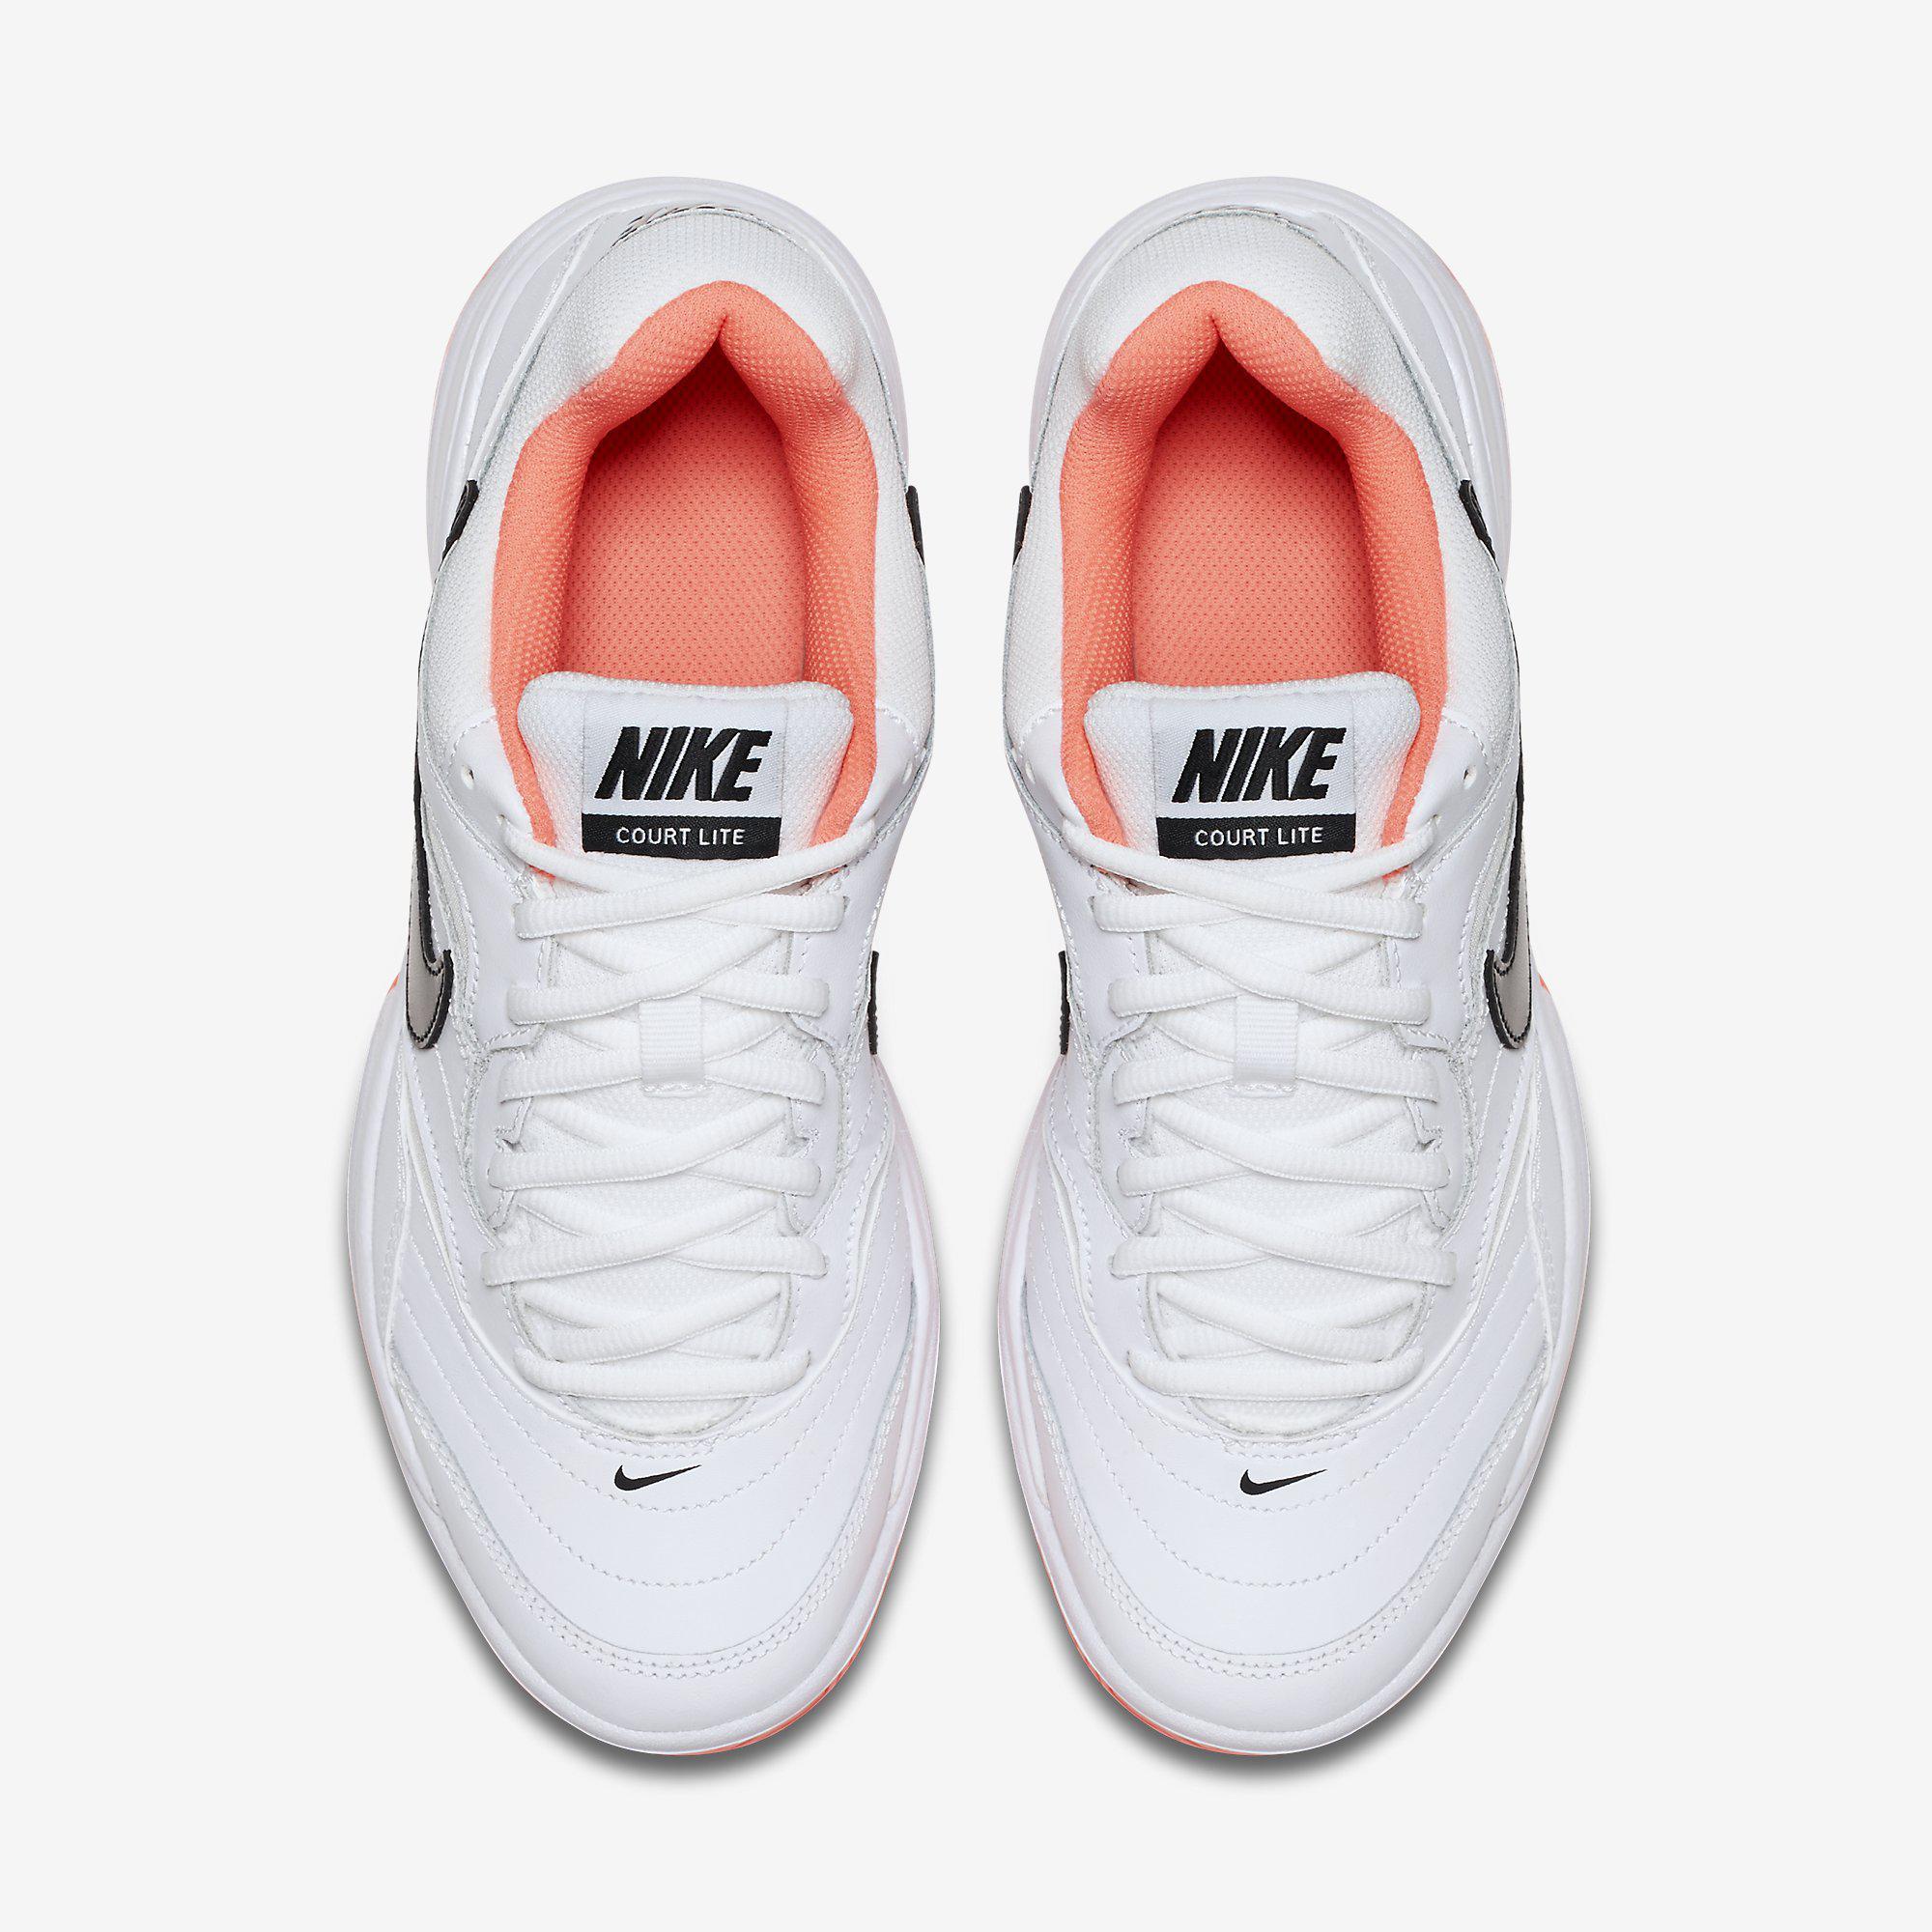 dca2d97cc51 Nike Womens Court Lite Tennis Shoes - White Bright Mango ...